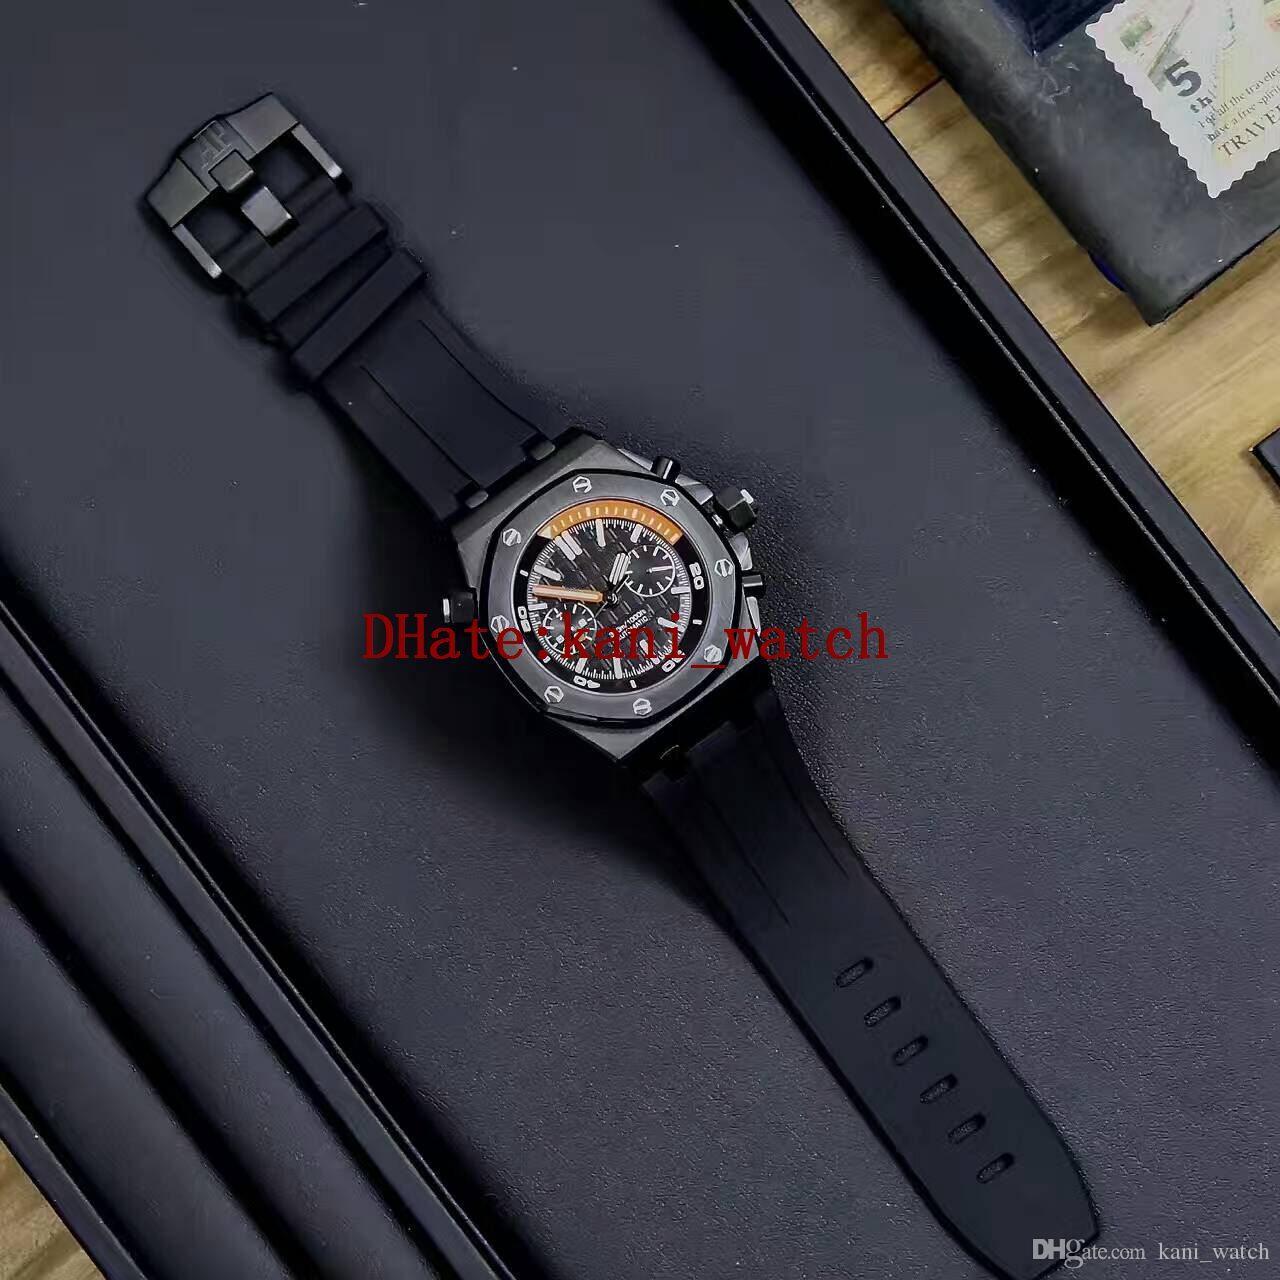 71d2e22ac7ee Compre Luxury Brand New AAA Quality Boutique Reloj Para Hombre Multifunción  Cronógrafo J03209 Automatic Mechanical Watch 42mm Reloj Para Hombre A   135.03 ...